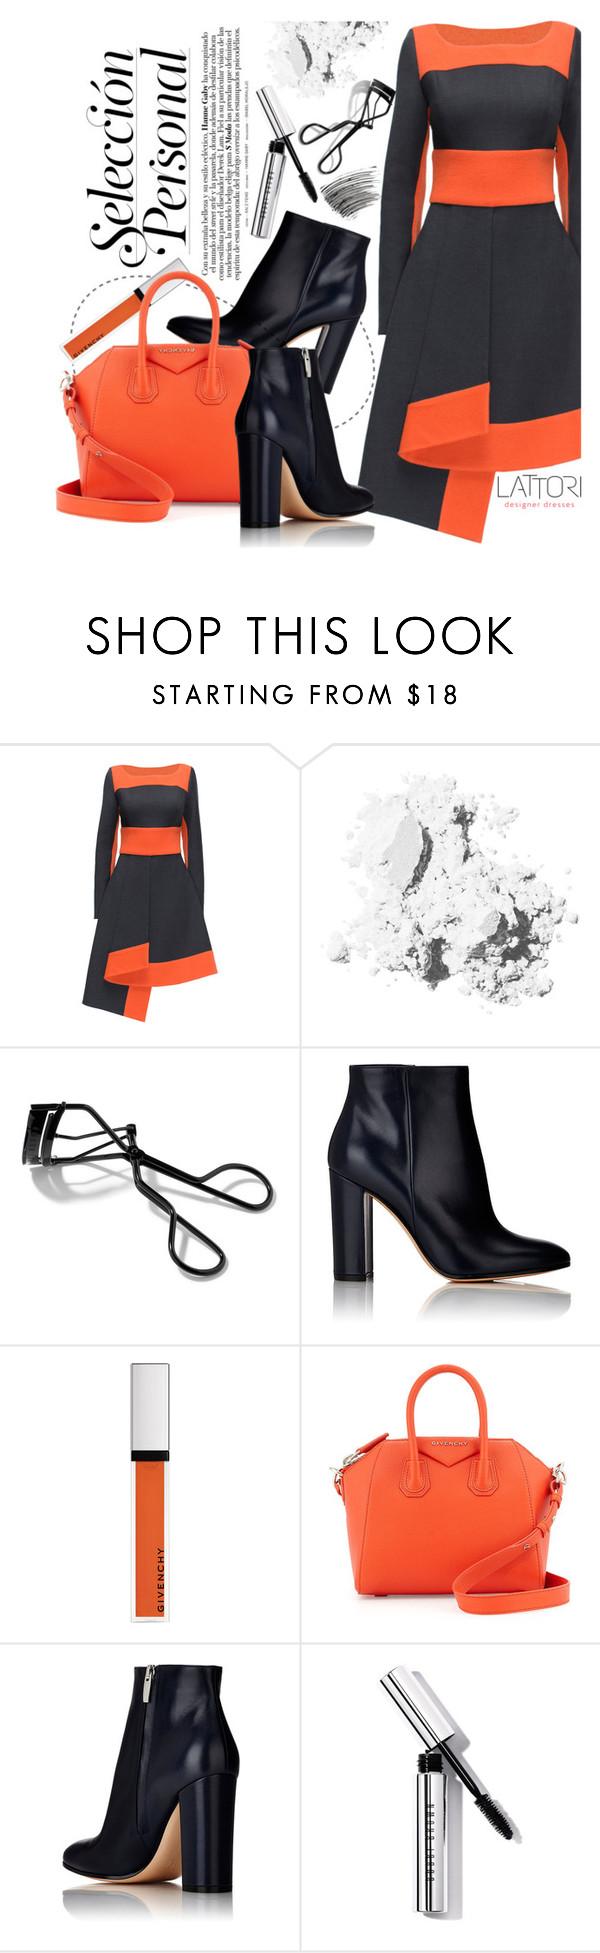 """Lattori Dress"" by pokadoll ❤ liked on Polyvore featuring moda, Lattori, Bobbi Brown Cosmetics, Gianvito Rossi, Givenchy y lattori"